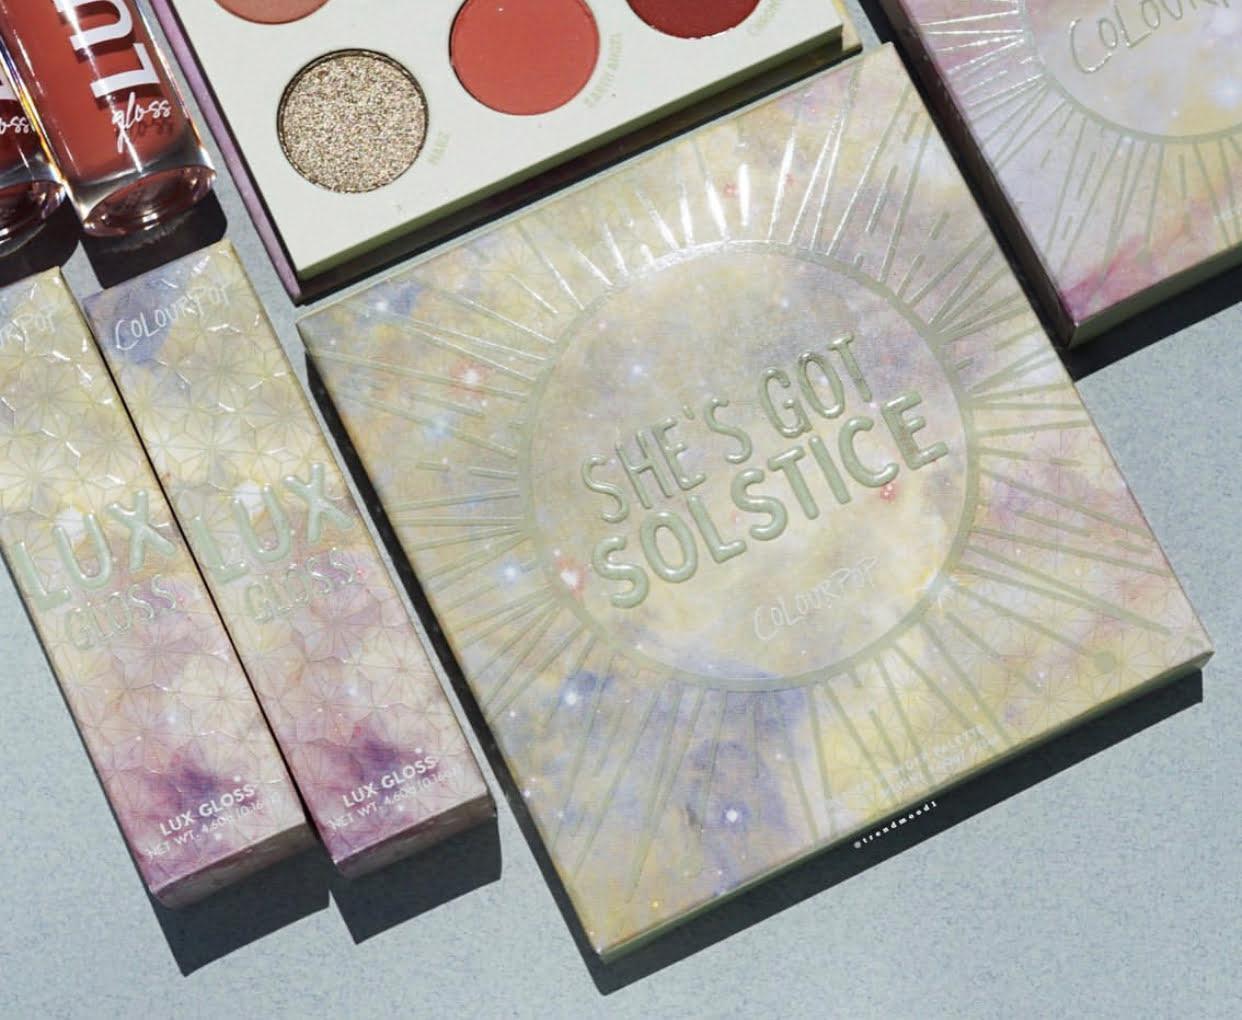 ColourPop She's Got Solstice Collection